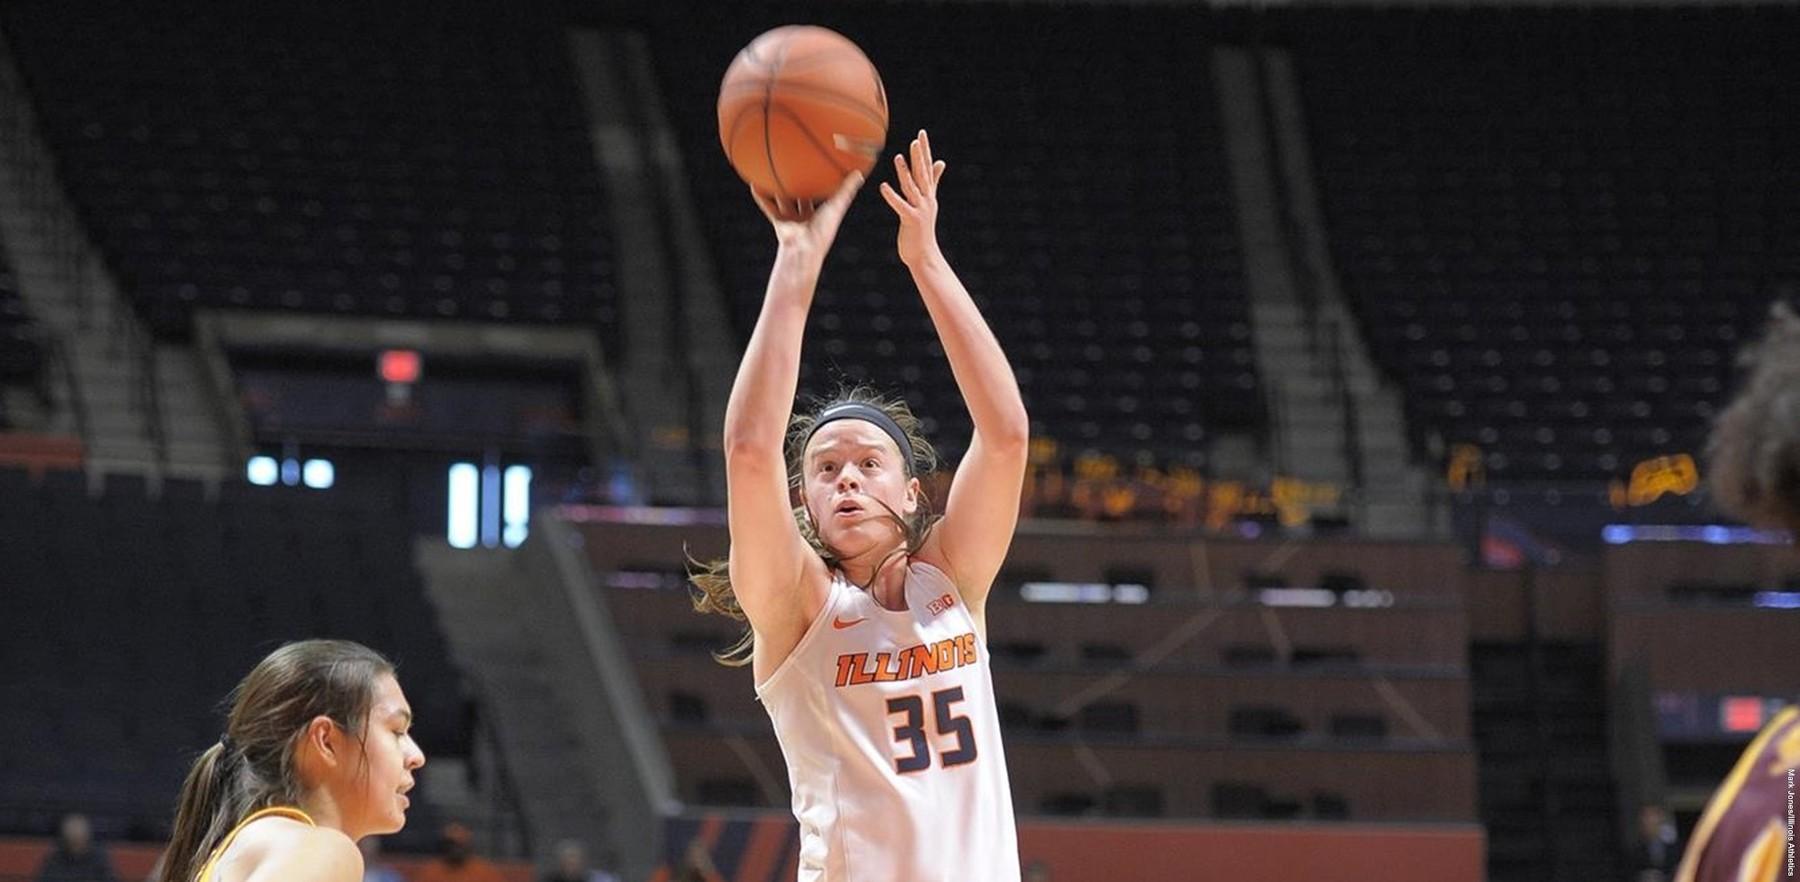 Image of women's basketball player Alex Wittinger